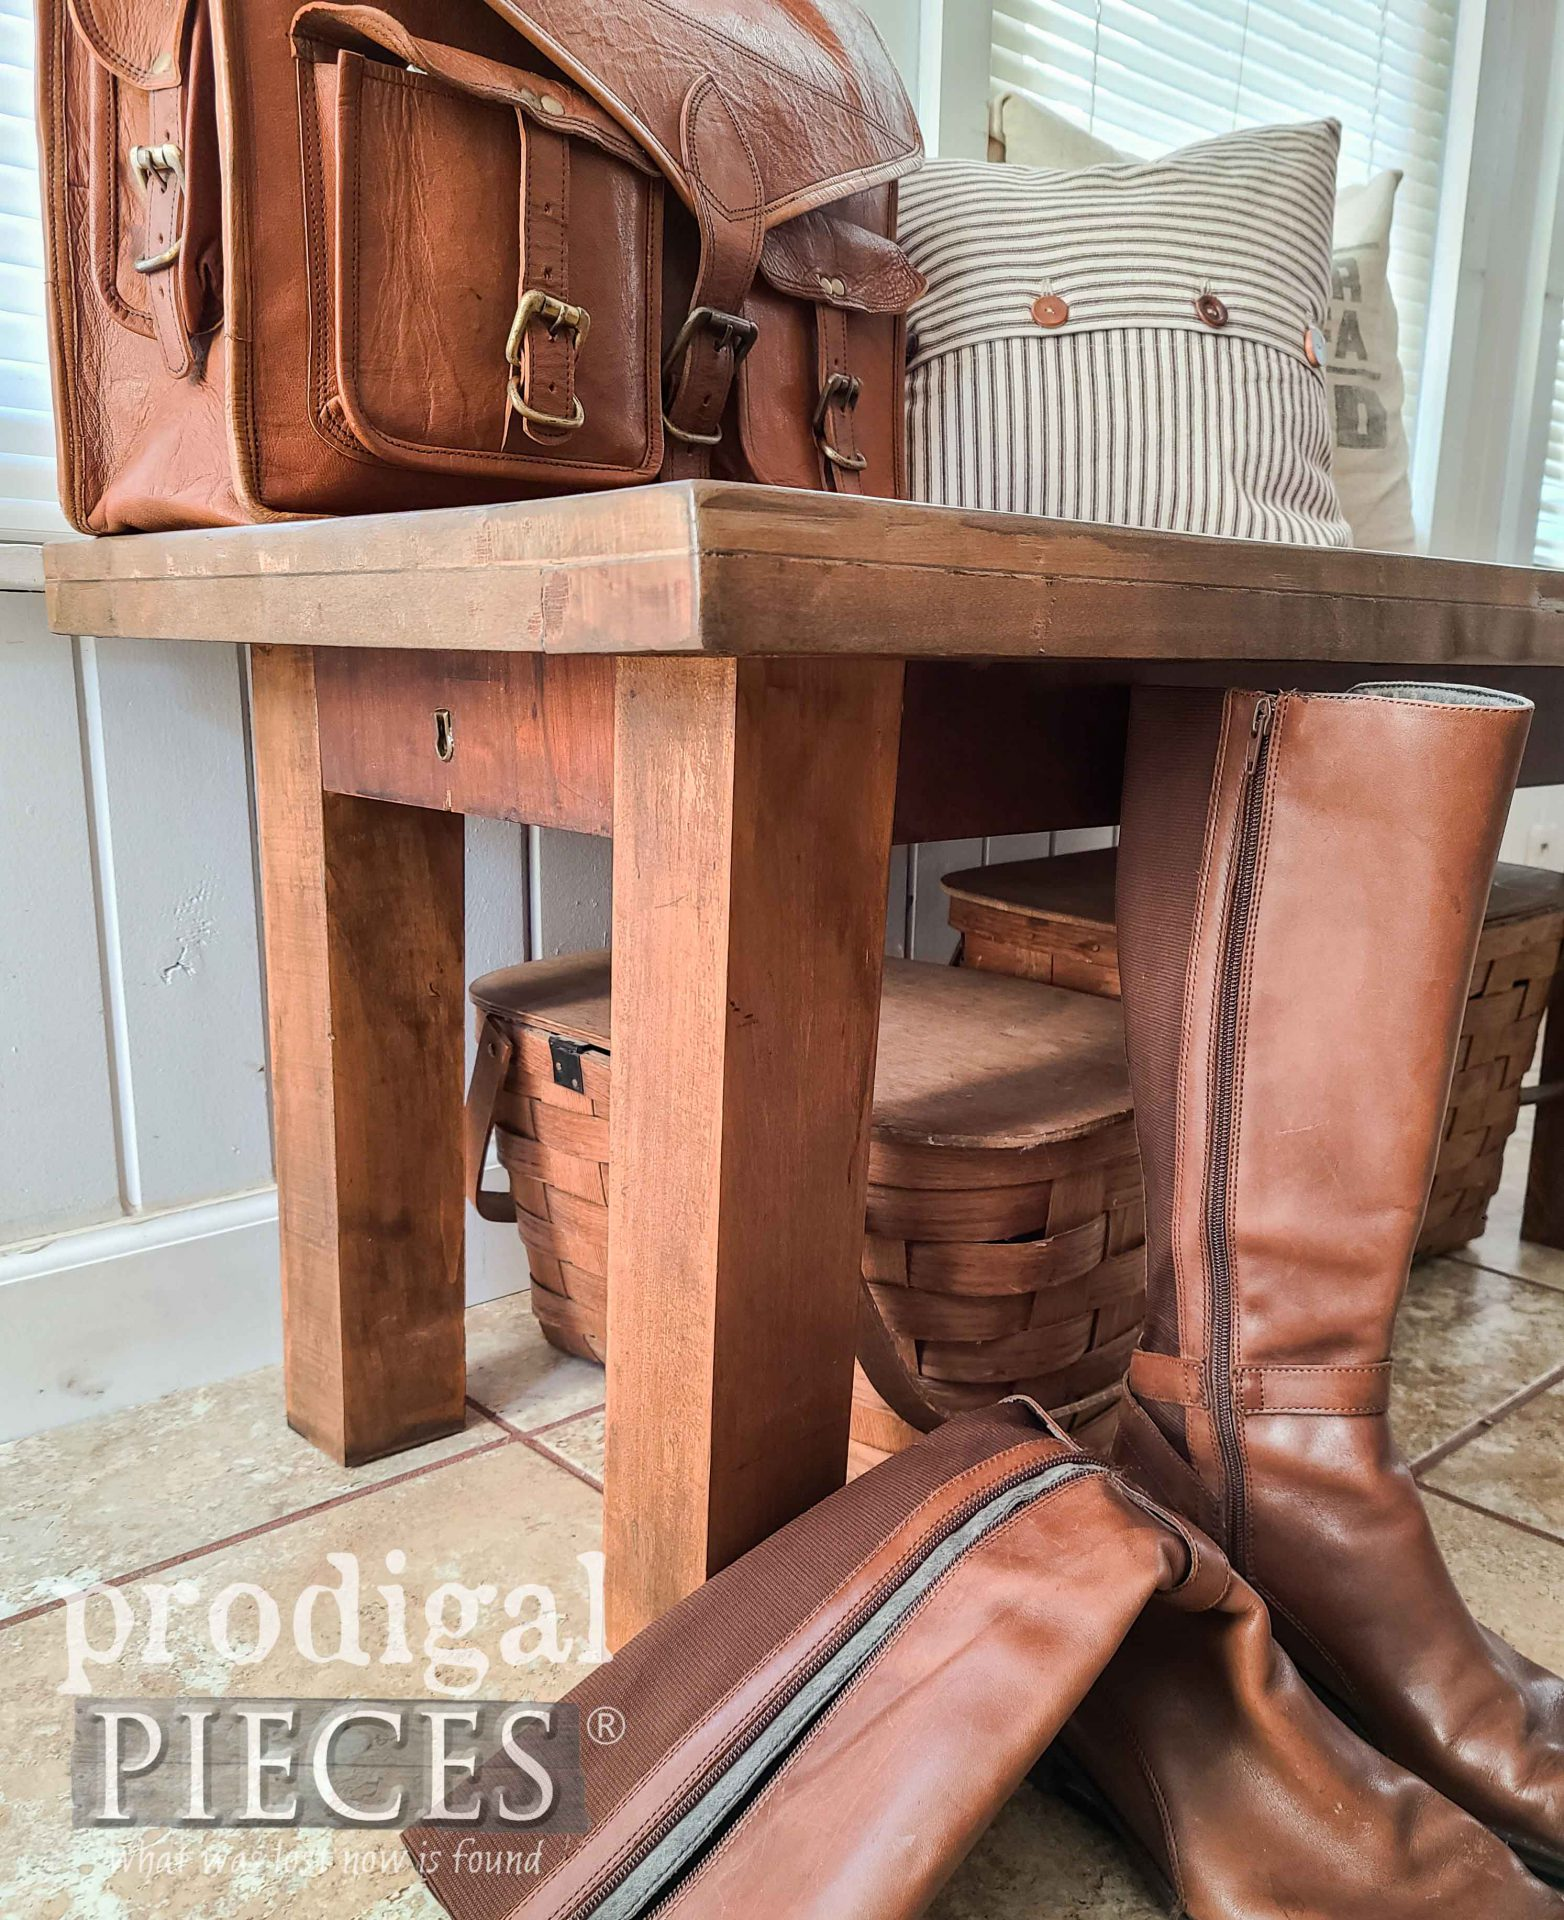 Handmade Farmhouse Bench for Home Decor by Larissa of Prodigal Pieces   prodigalpieces.com #prodigalpieces #diy #home #woodworking #trashure